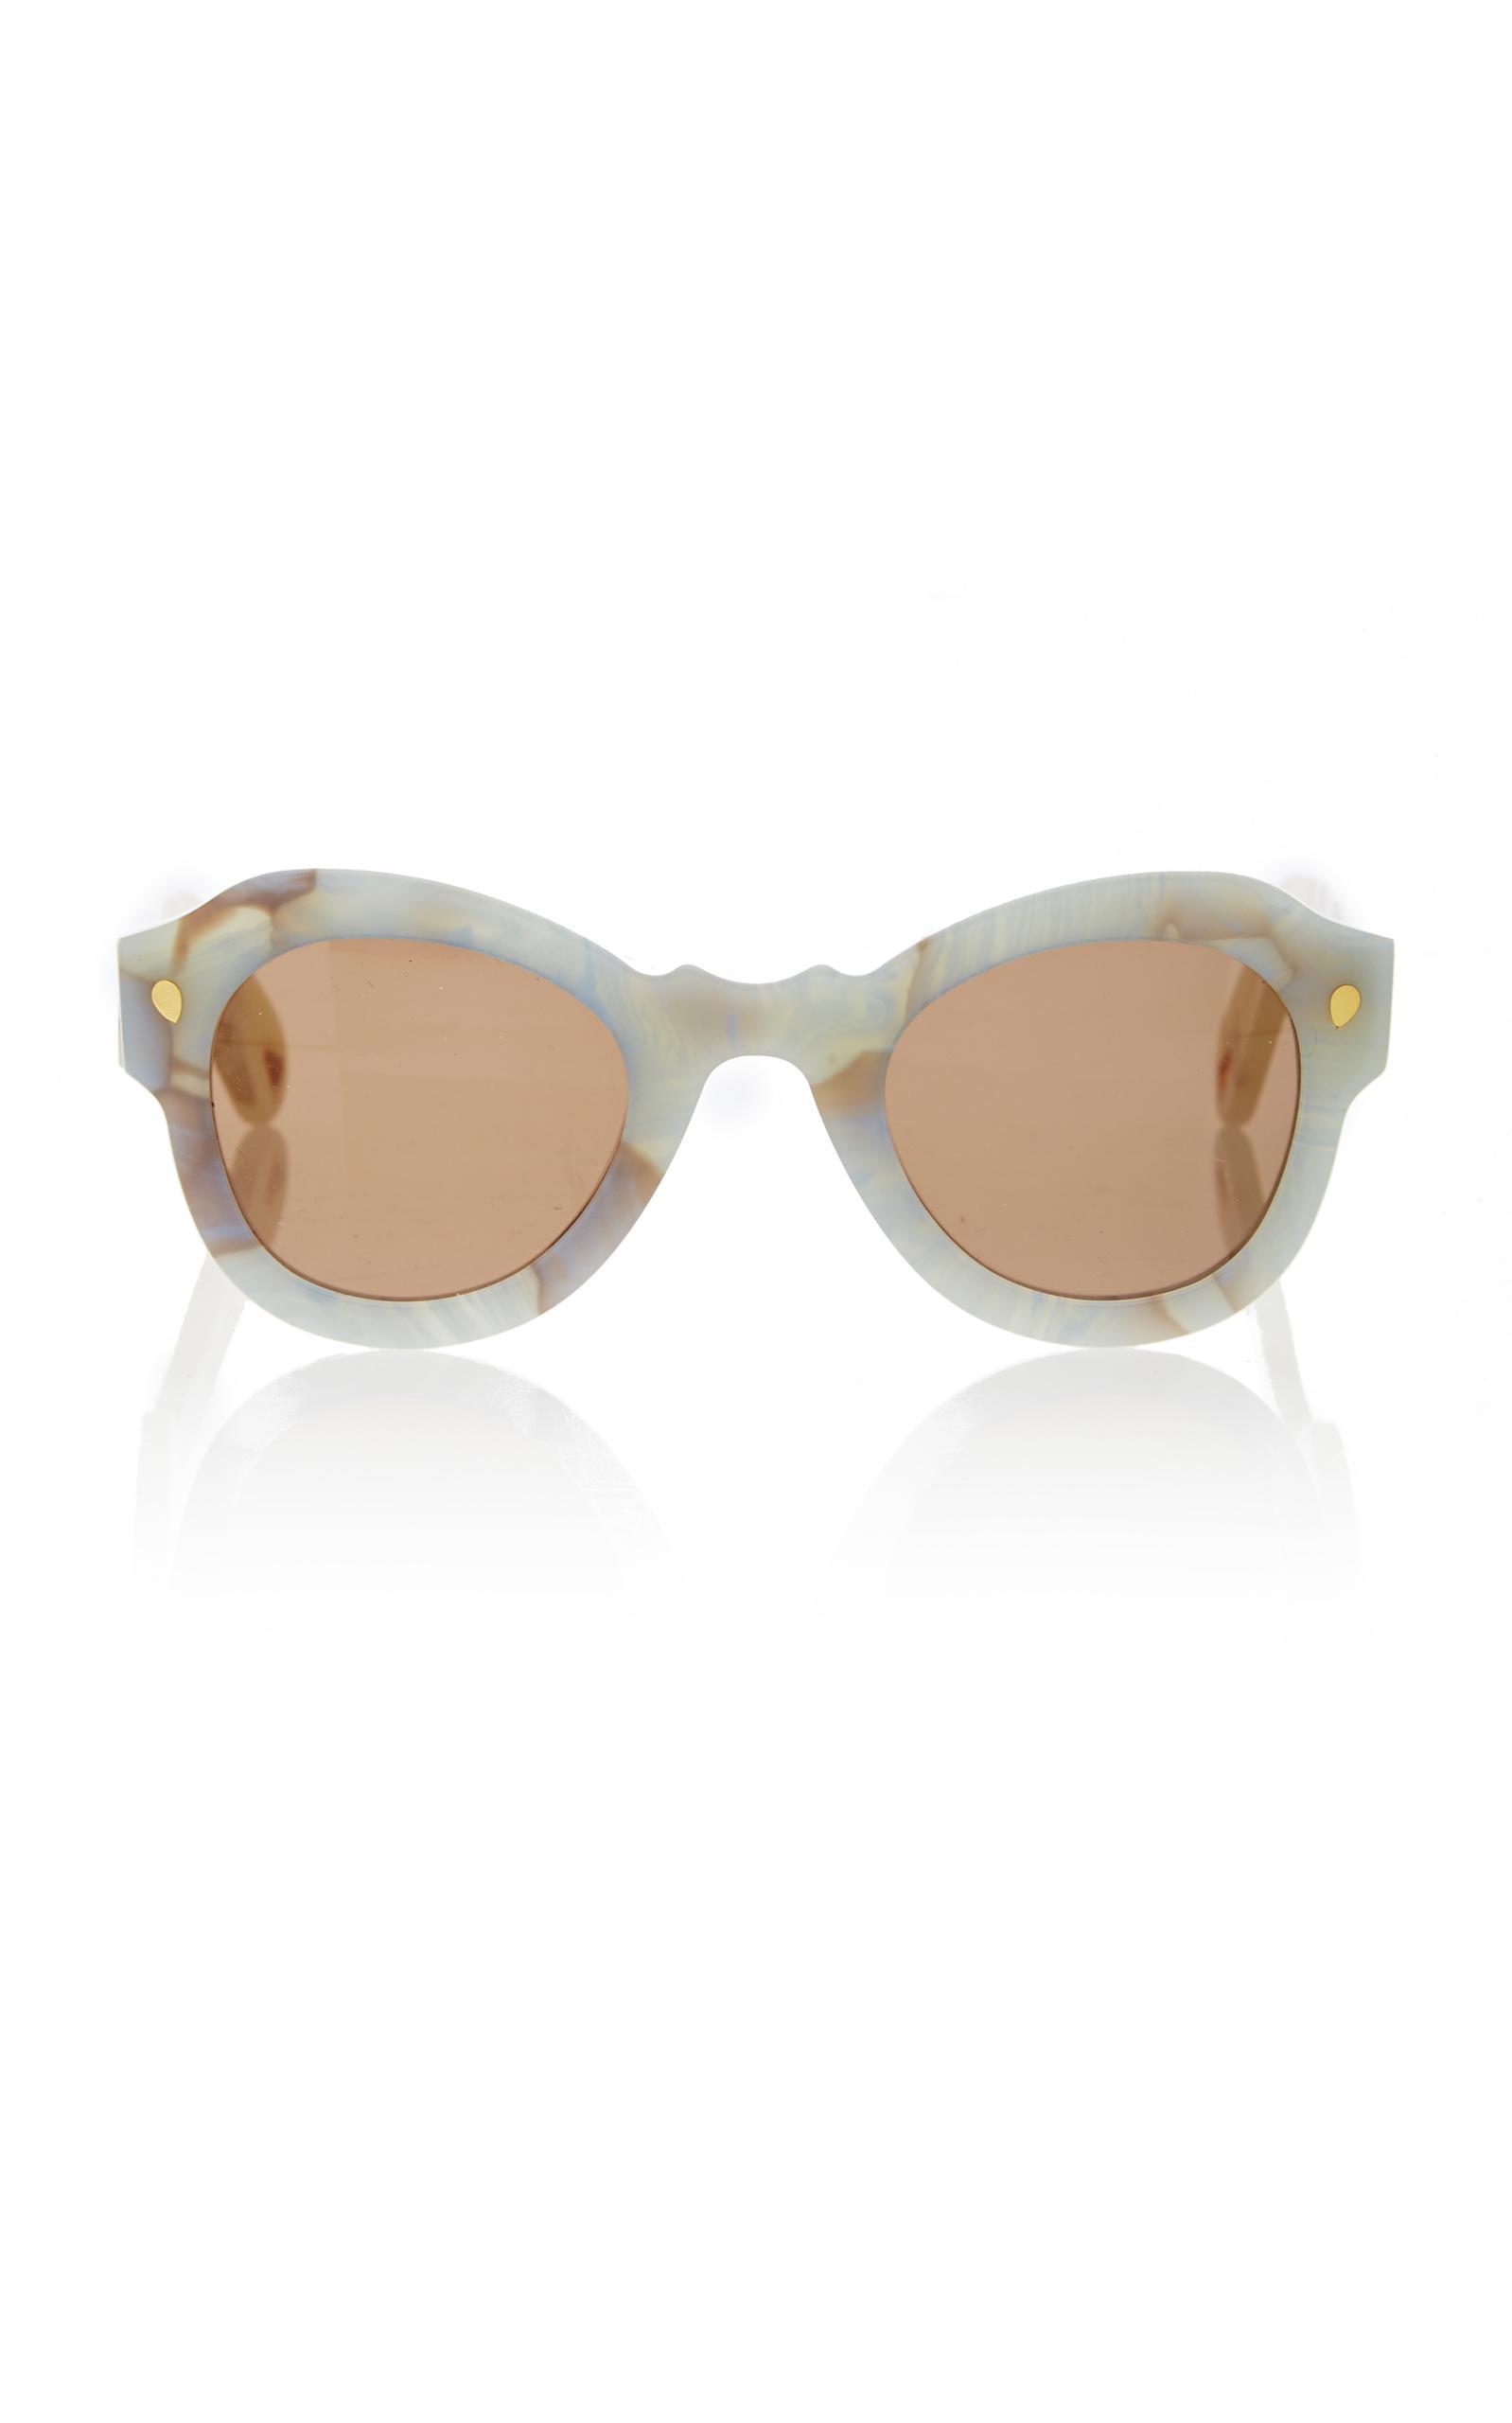 ca4481c3469 Lucy Folk Fly Away Sunglasses in Blue - Lyst